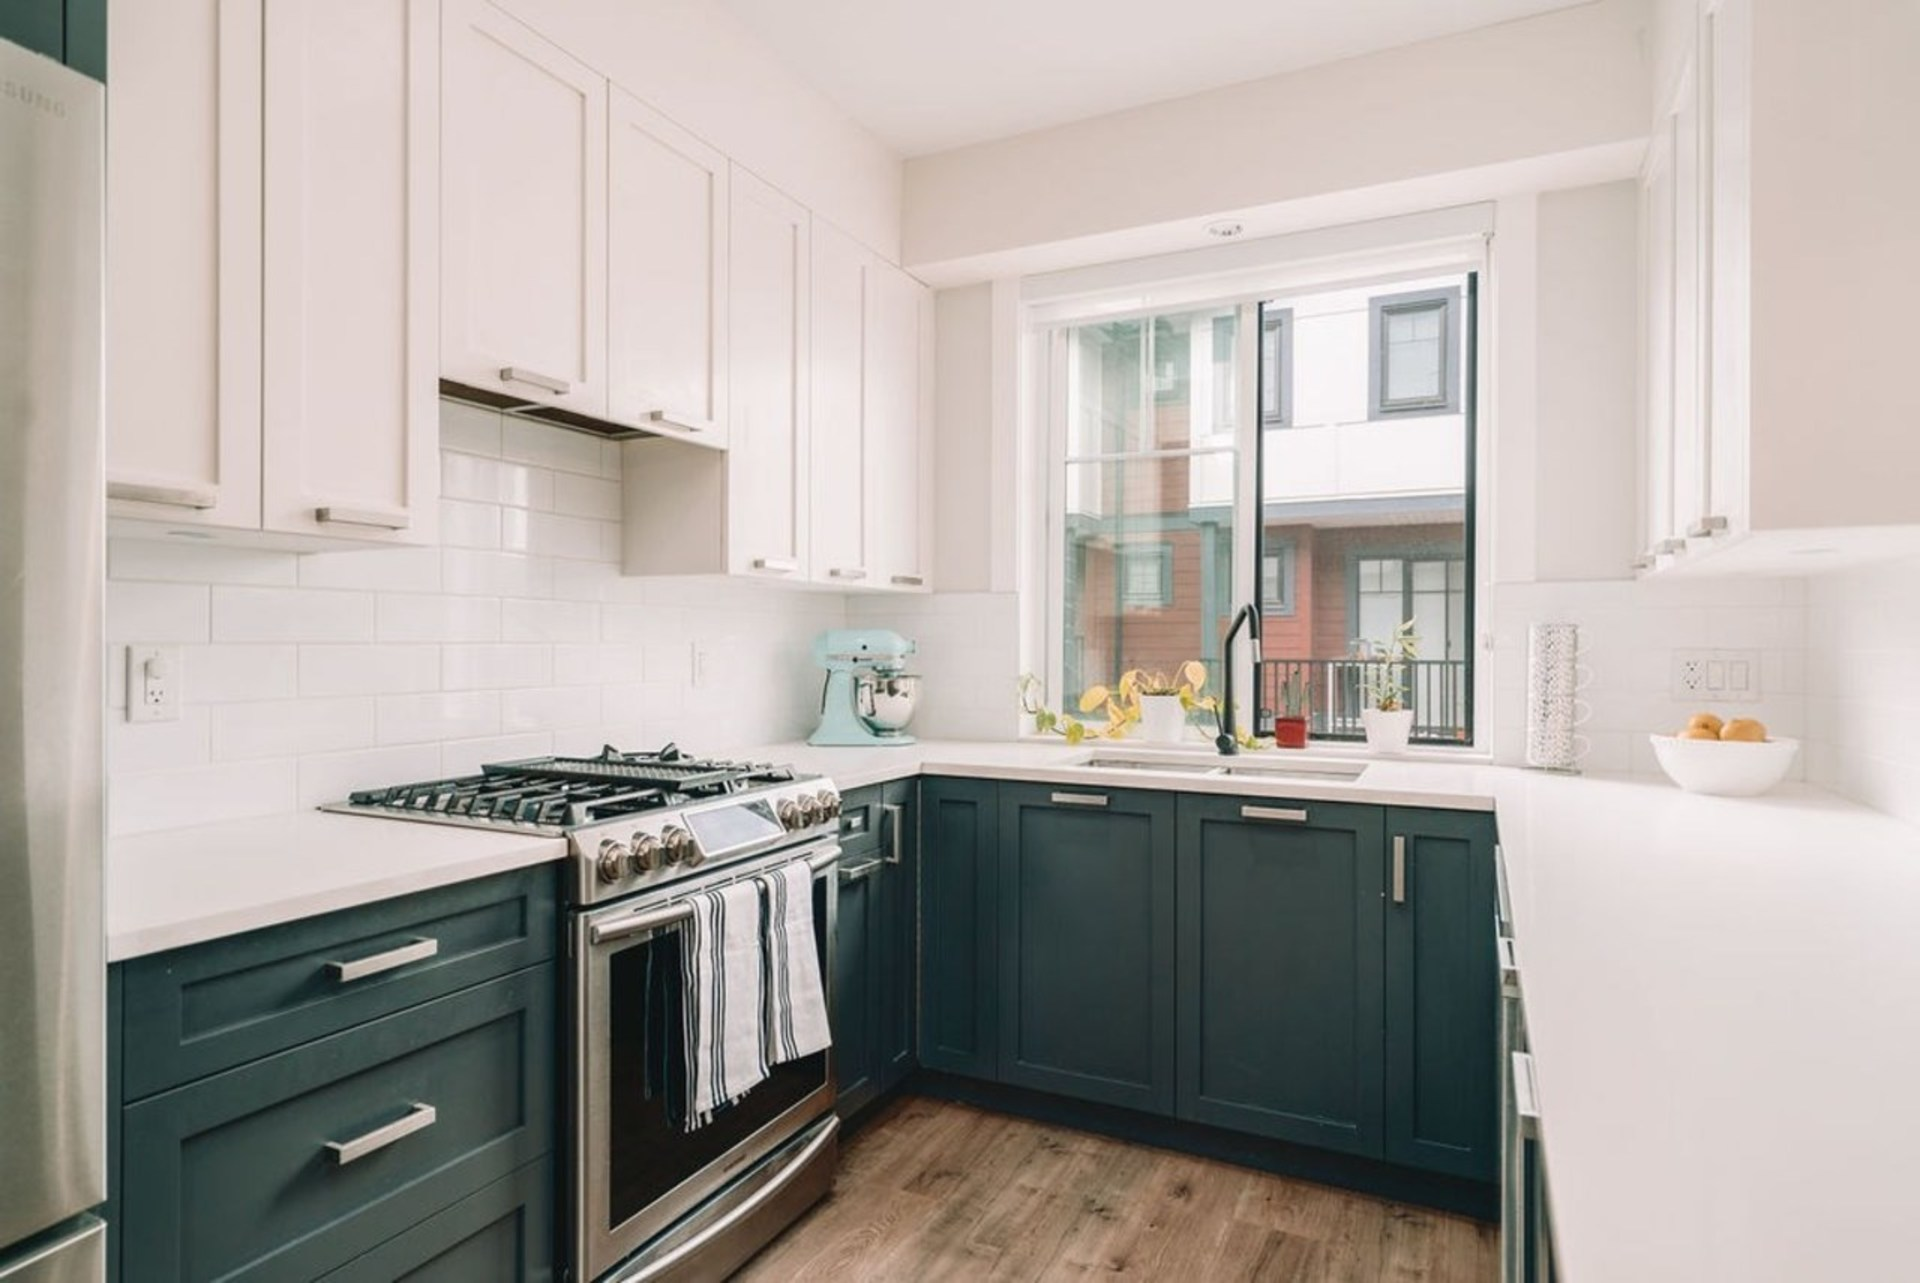 188-wood-street-queensborough-new-westminster-04 of 50 - 188 Wood Street, Queensborough, New Westminster